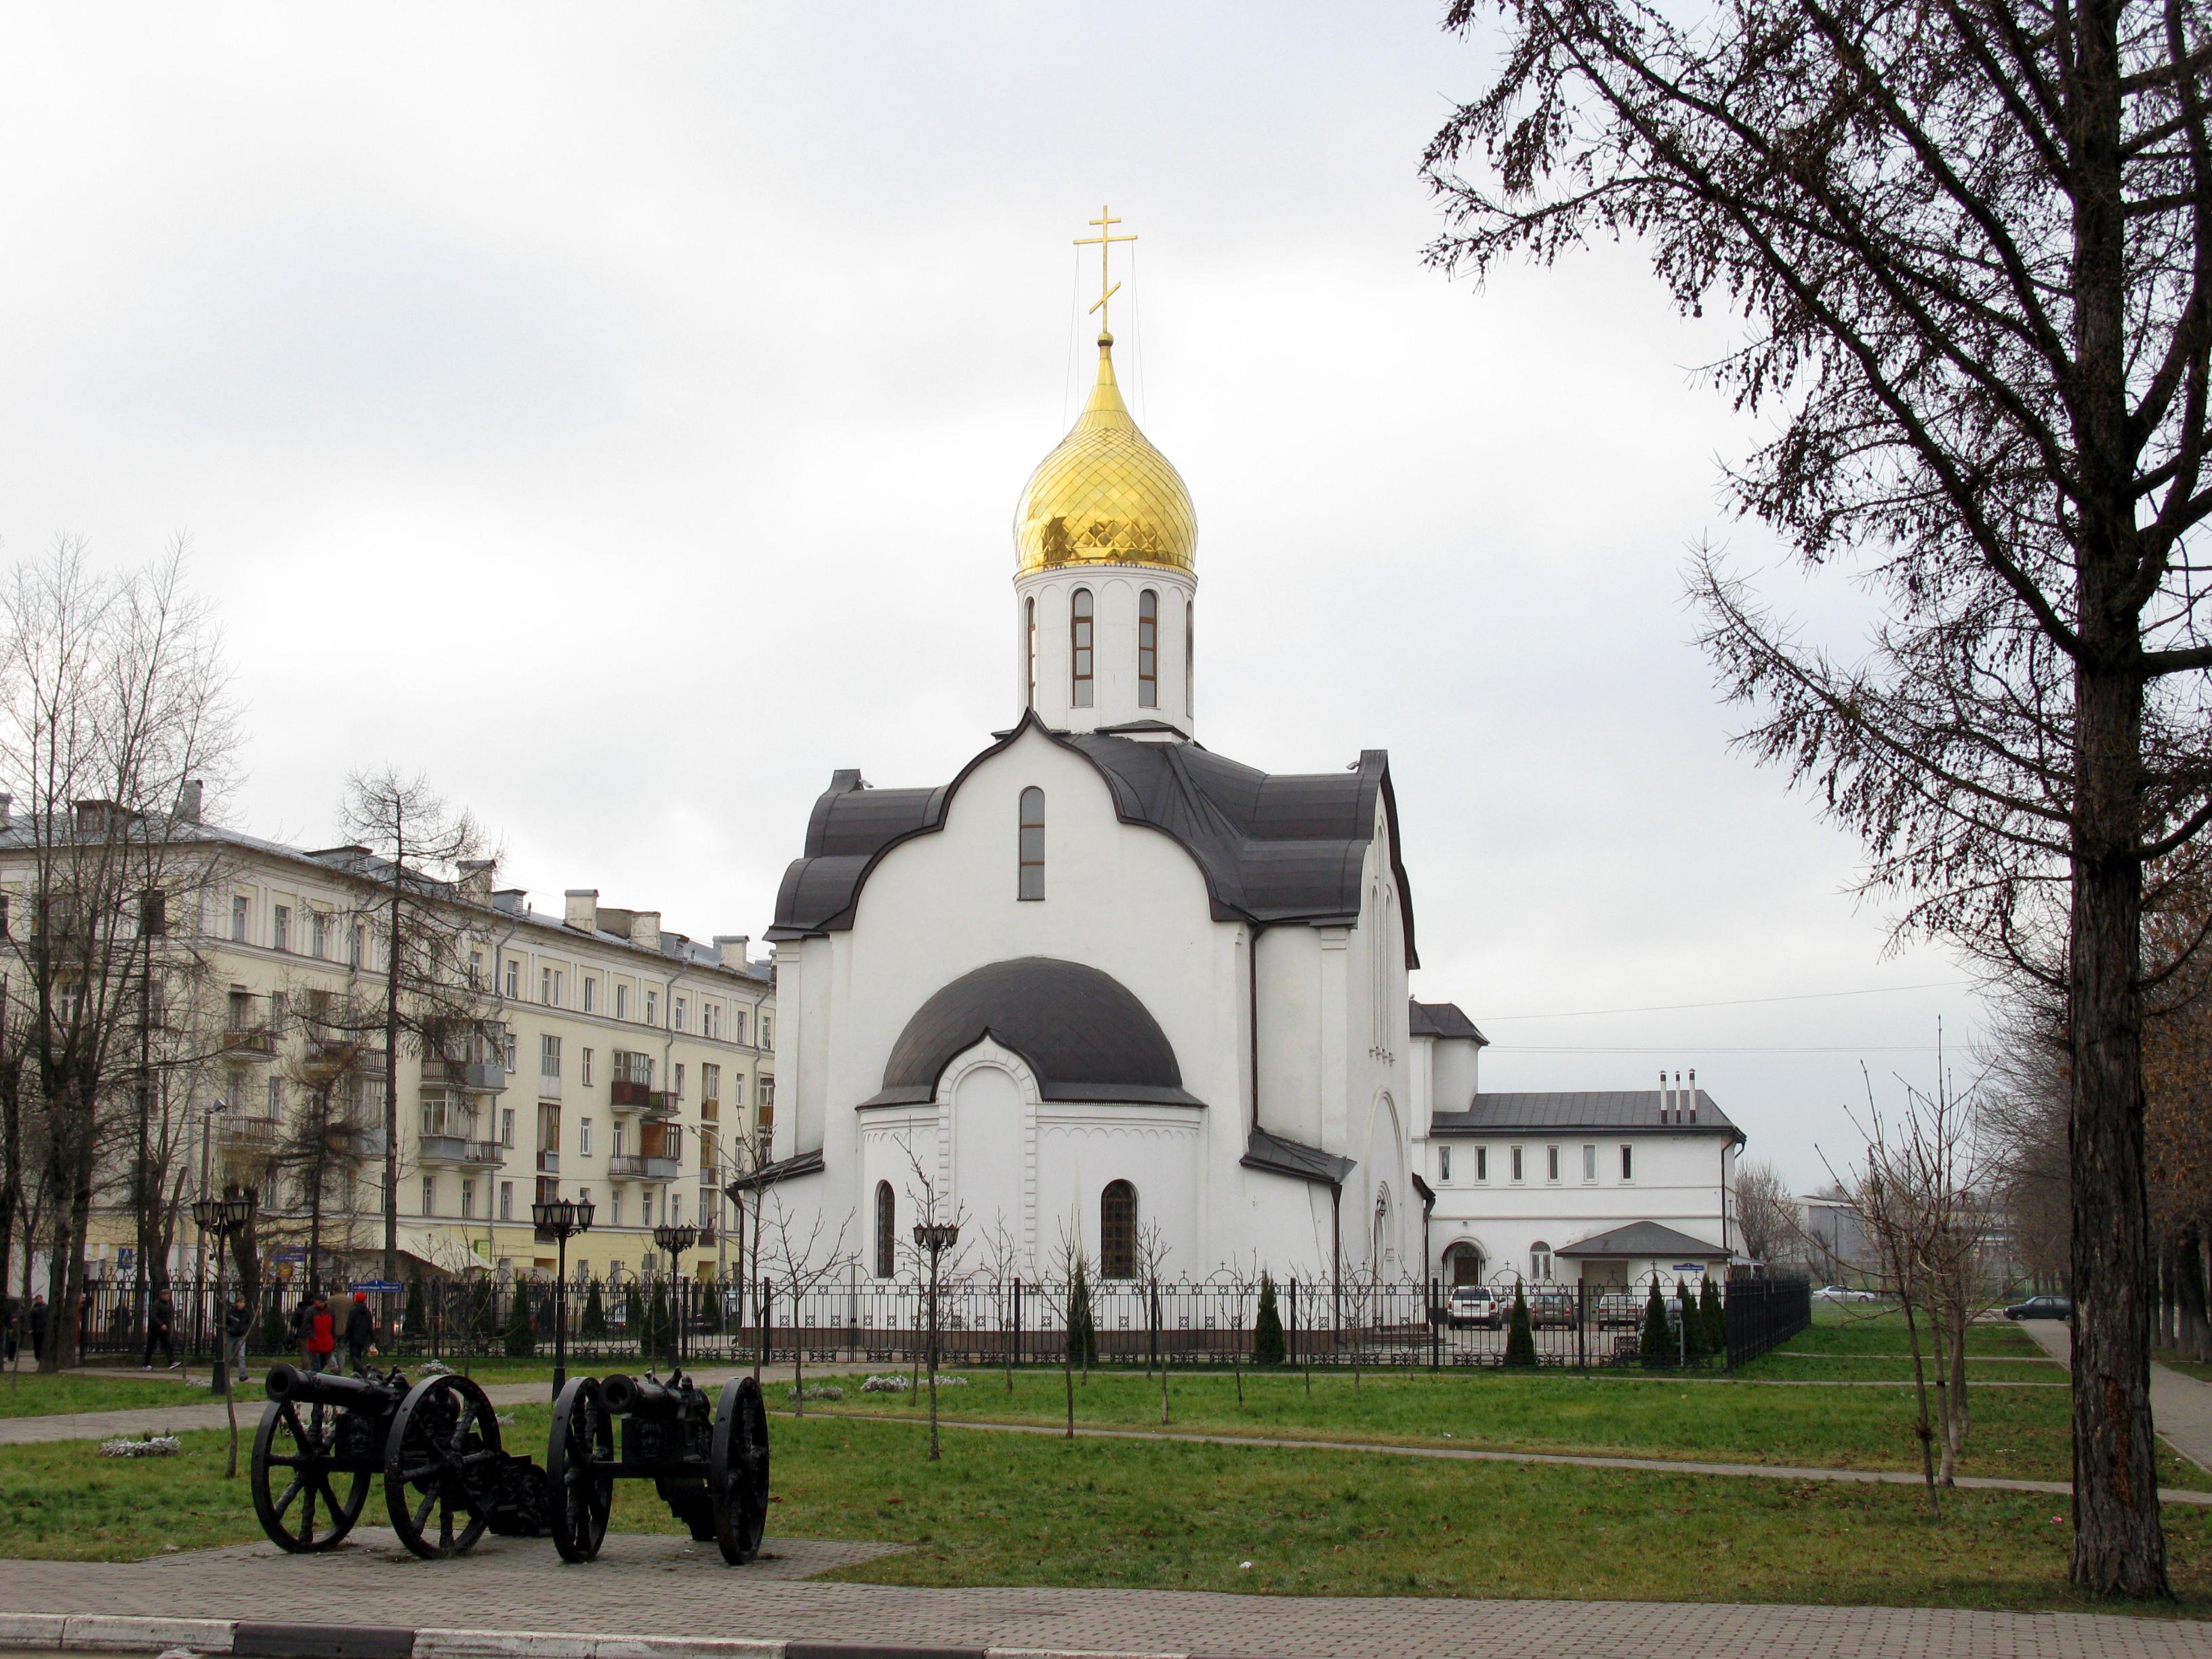 Файл:Church of Saint Alexander Nevsky (Balashikha) 12.jpg — Википедия